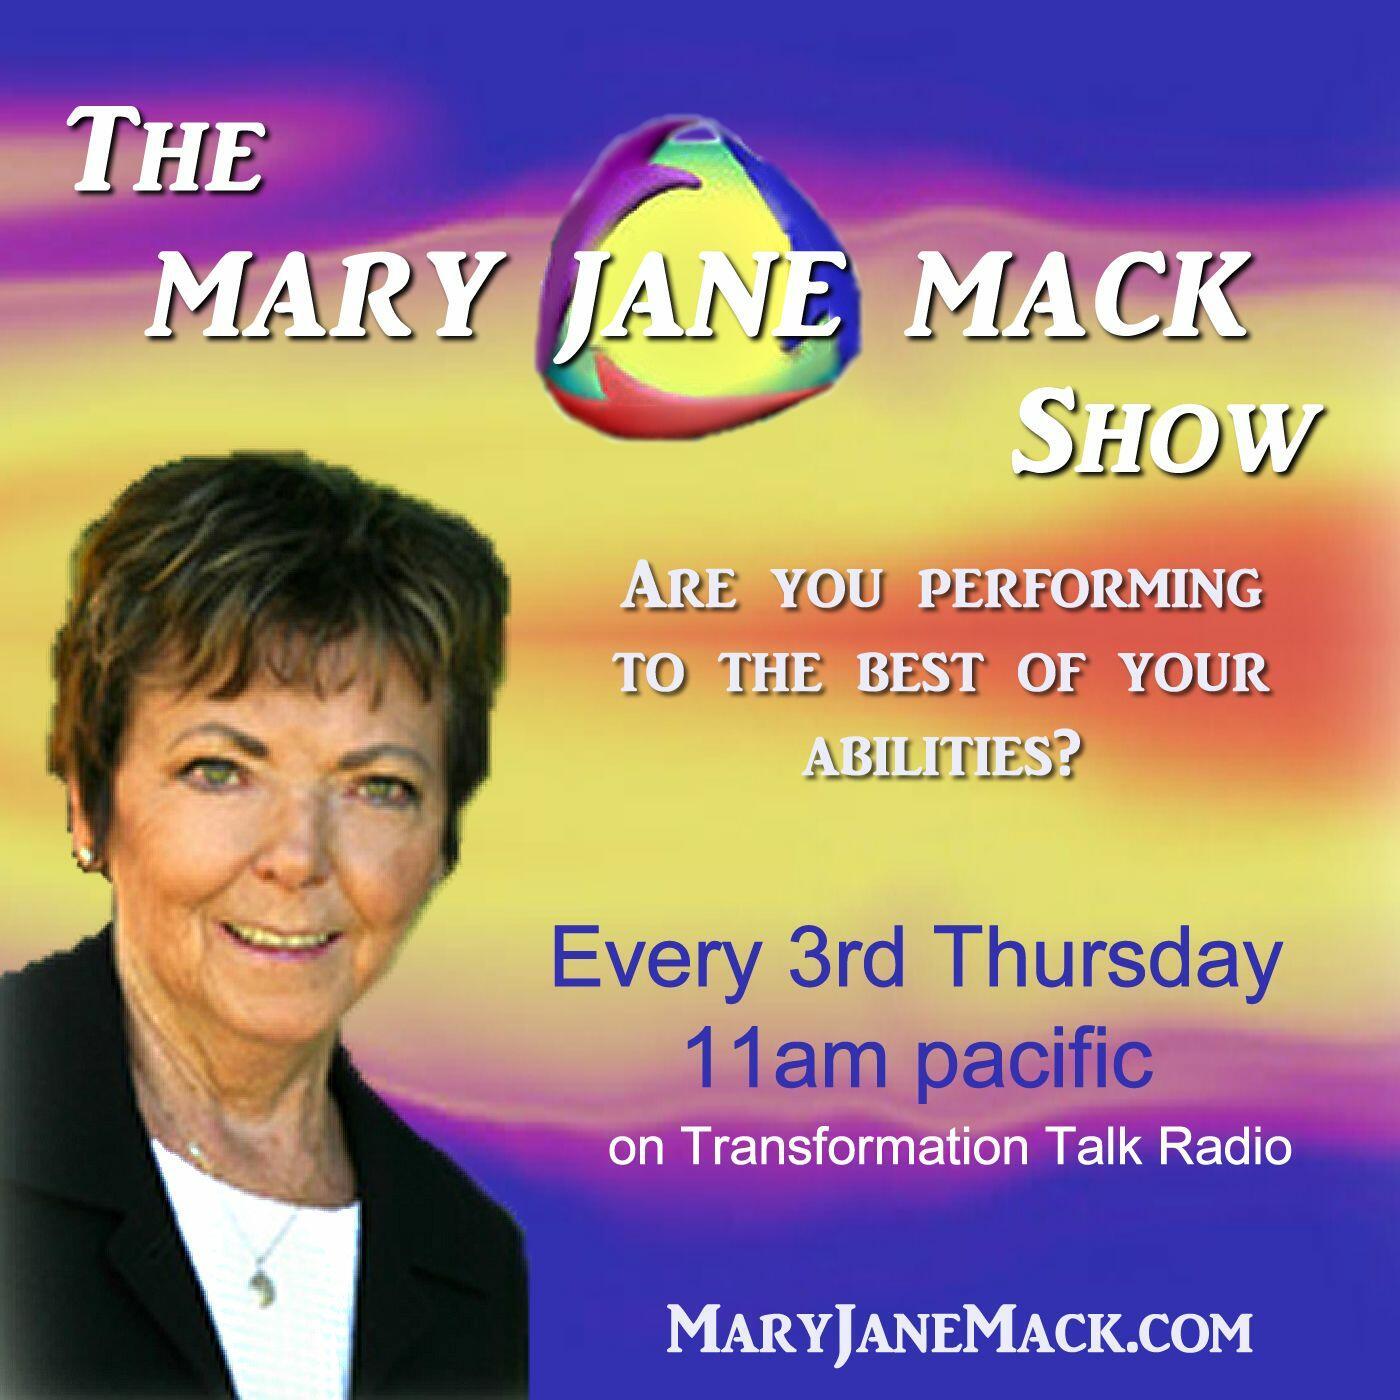 The Mary Jane Mack Show